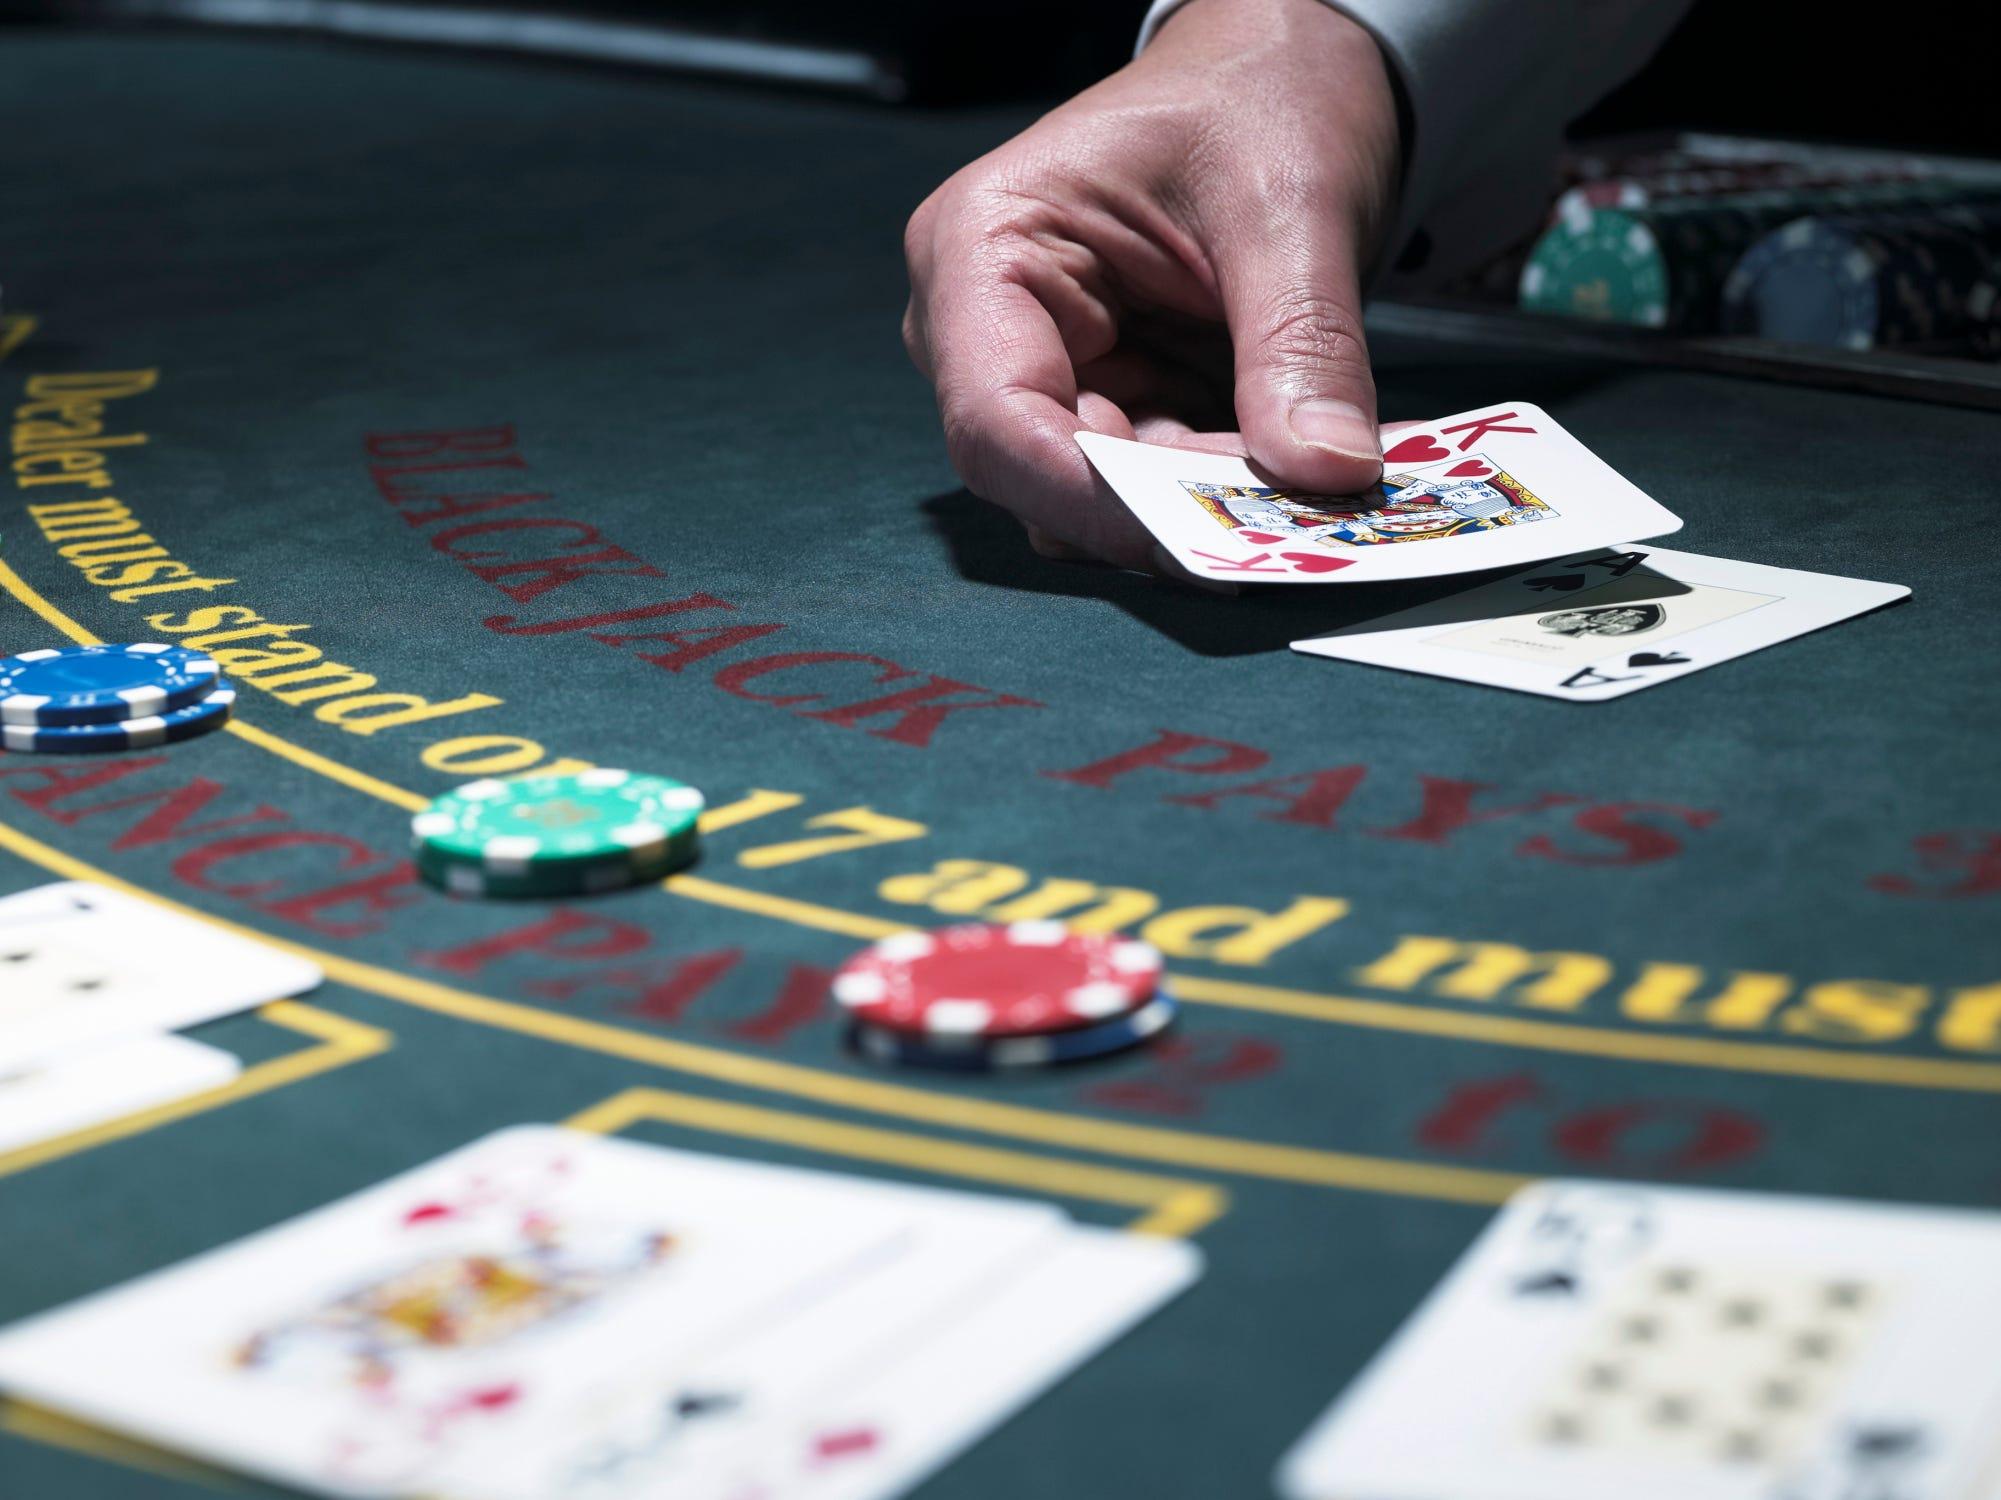 In debt due to gambling flamingo hotel casino las vegas com